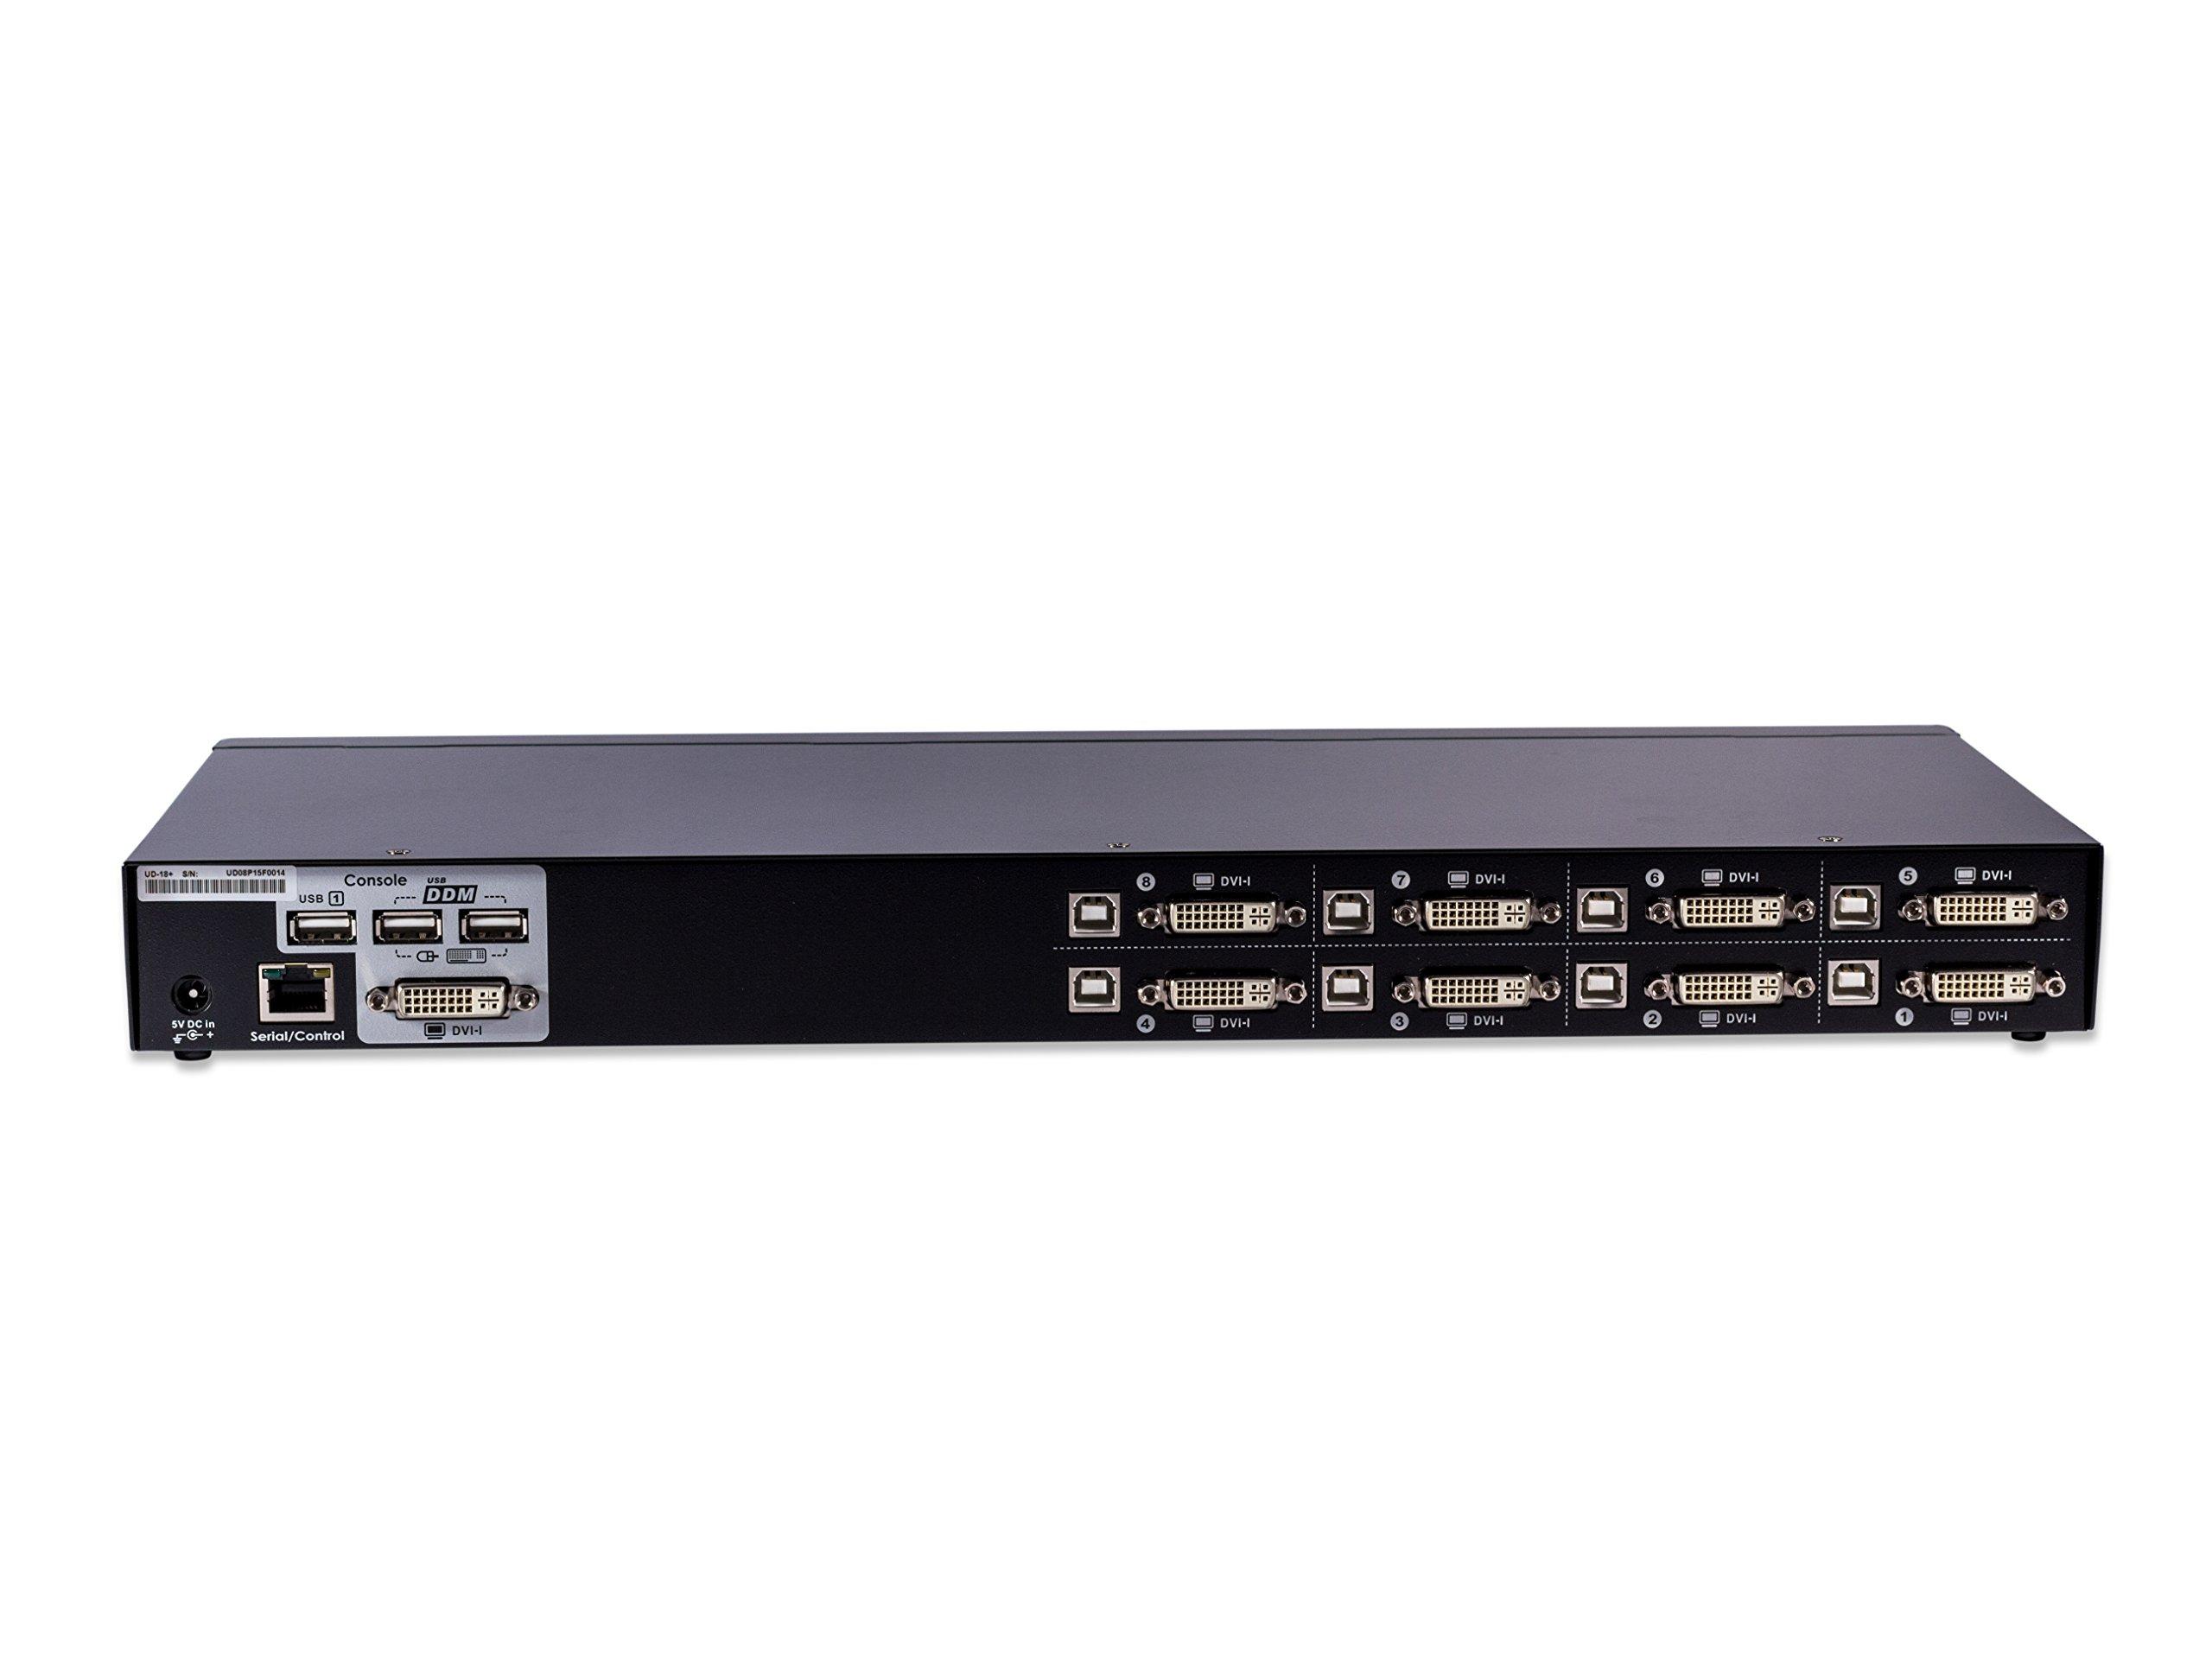 ConnectPro UD USB DVI KVM switch w/ DDM & multi-hotkey (8 Port, 6 ft) by ConnectPro (Image #2)